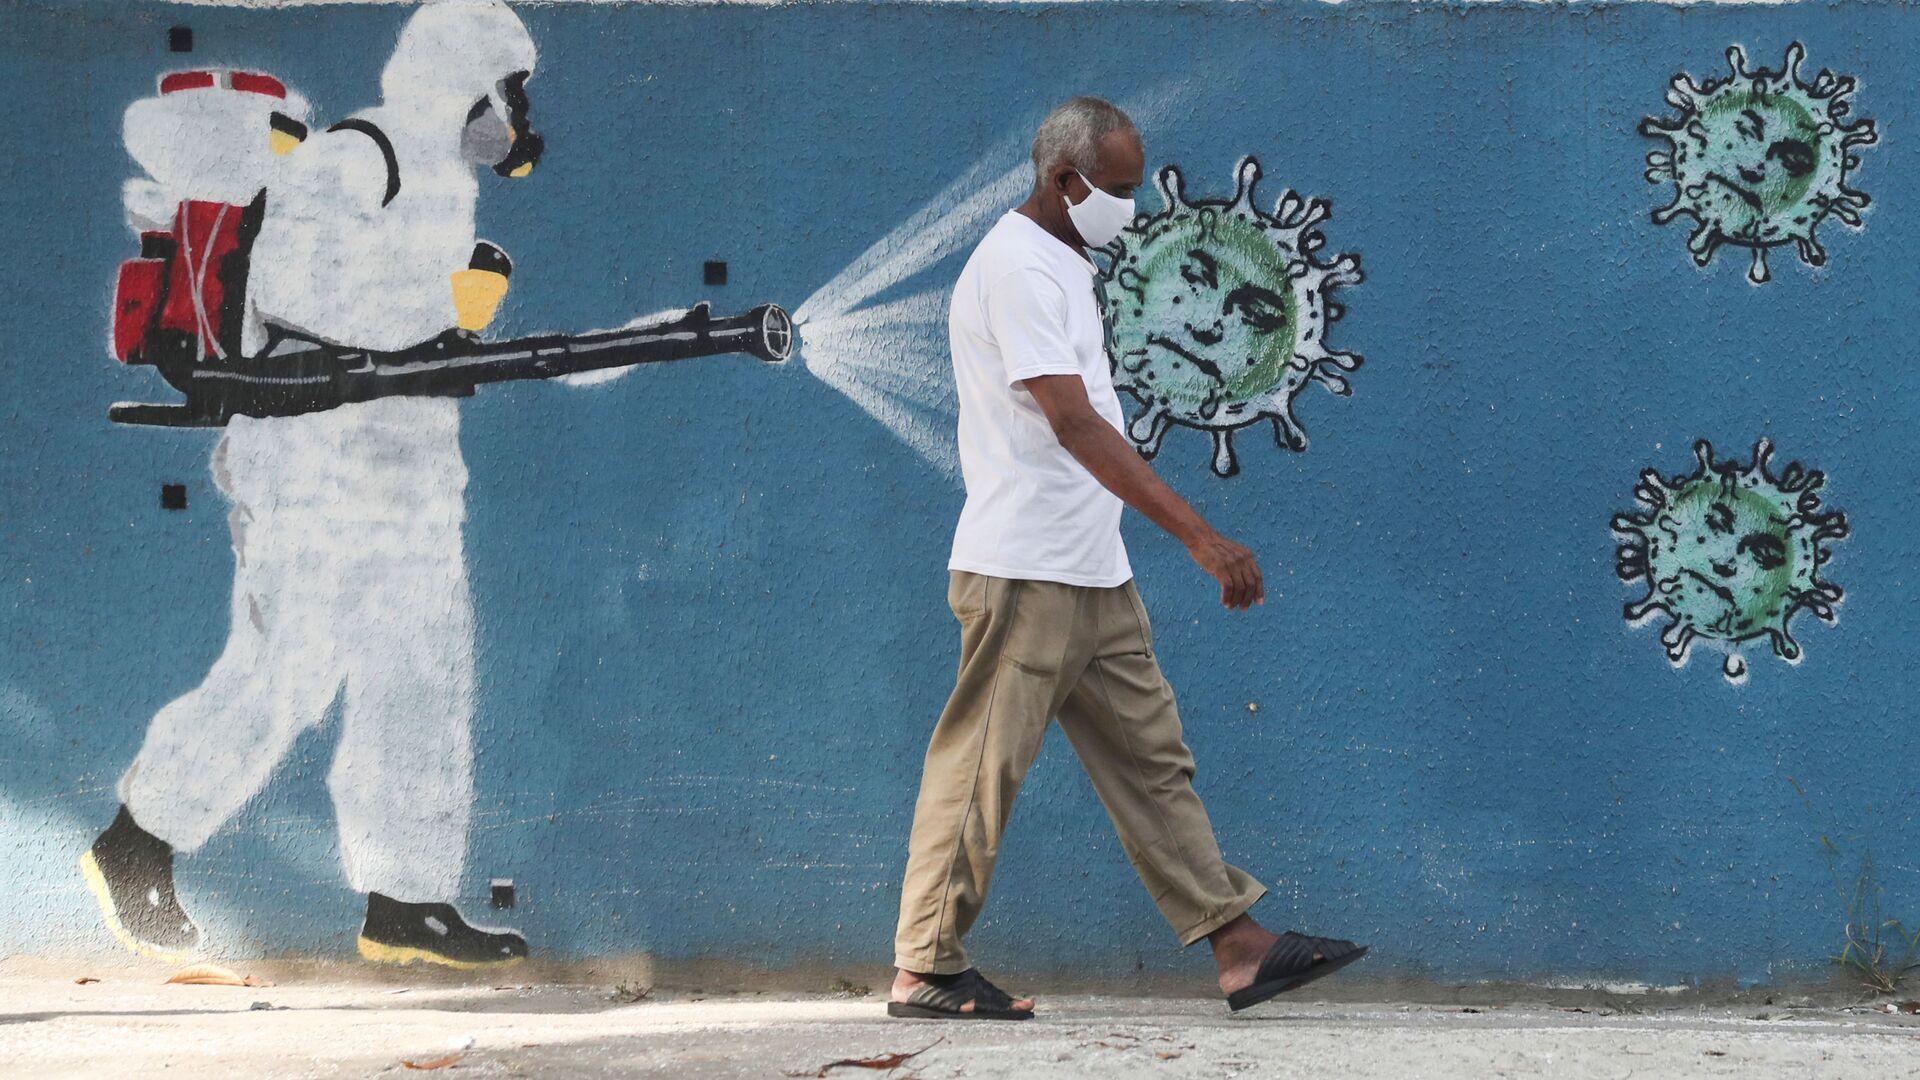 Un hombre caminando por las calles de Río de Janeiro, Brasil - Sputnik Mundo, 1920, 04.03.2021